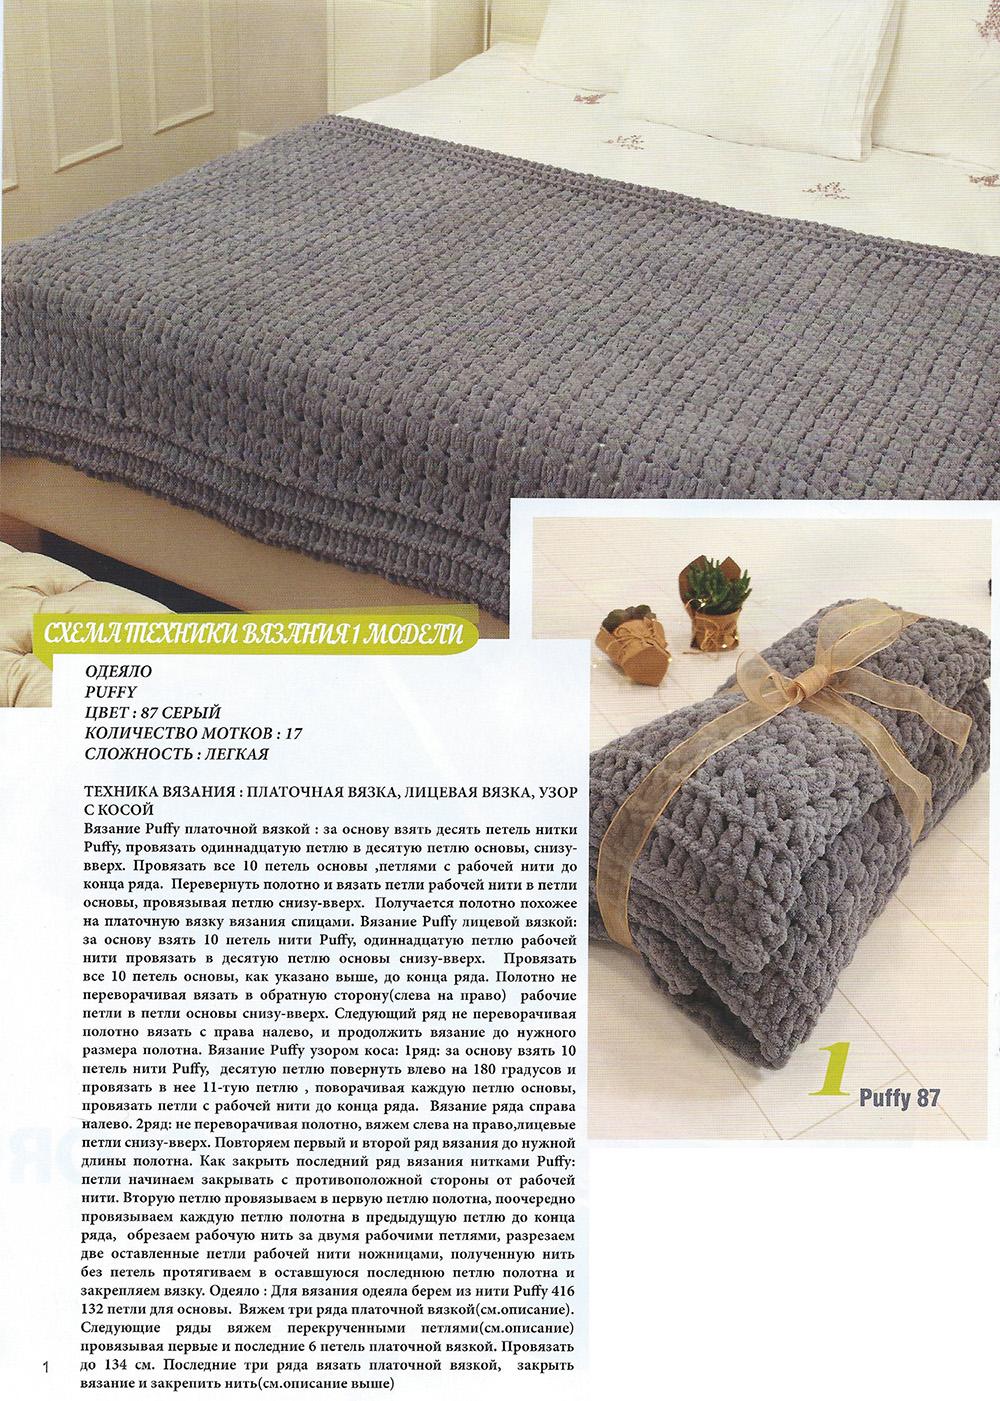 Схема техники вязания одеяла из пряжи PUFFY